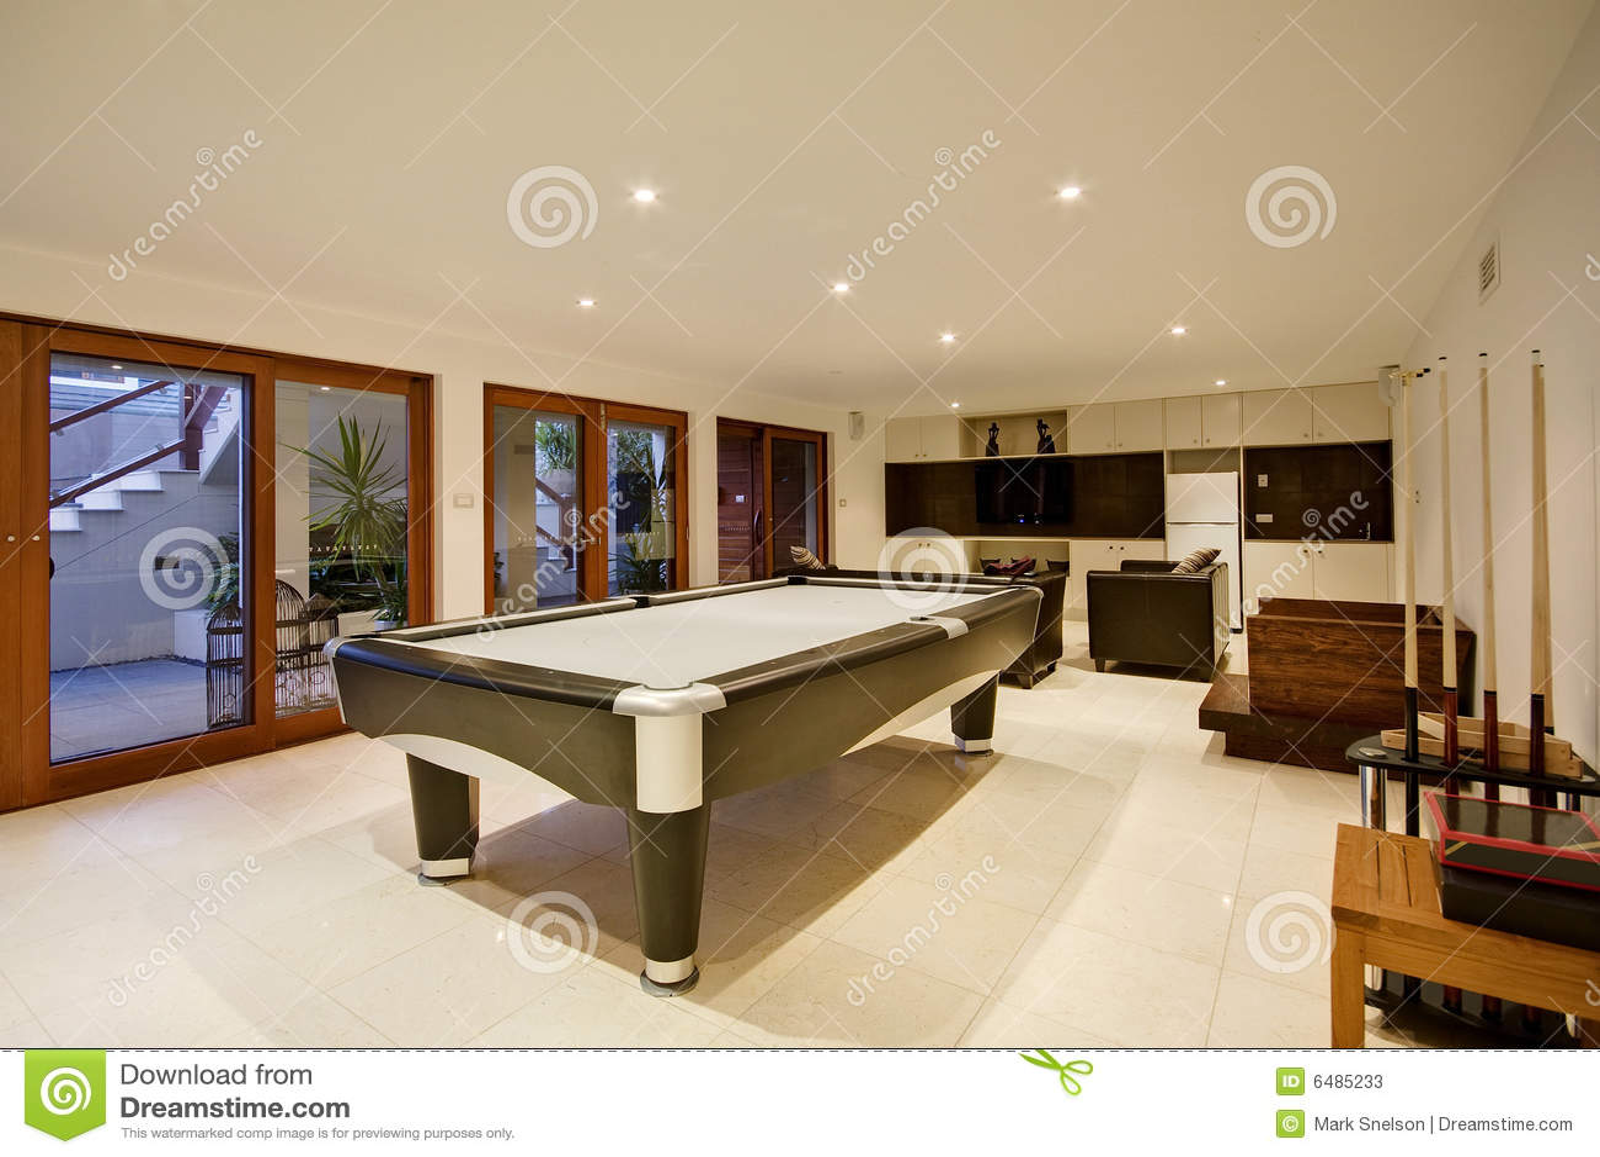 Luxury Recreation Room